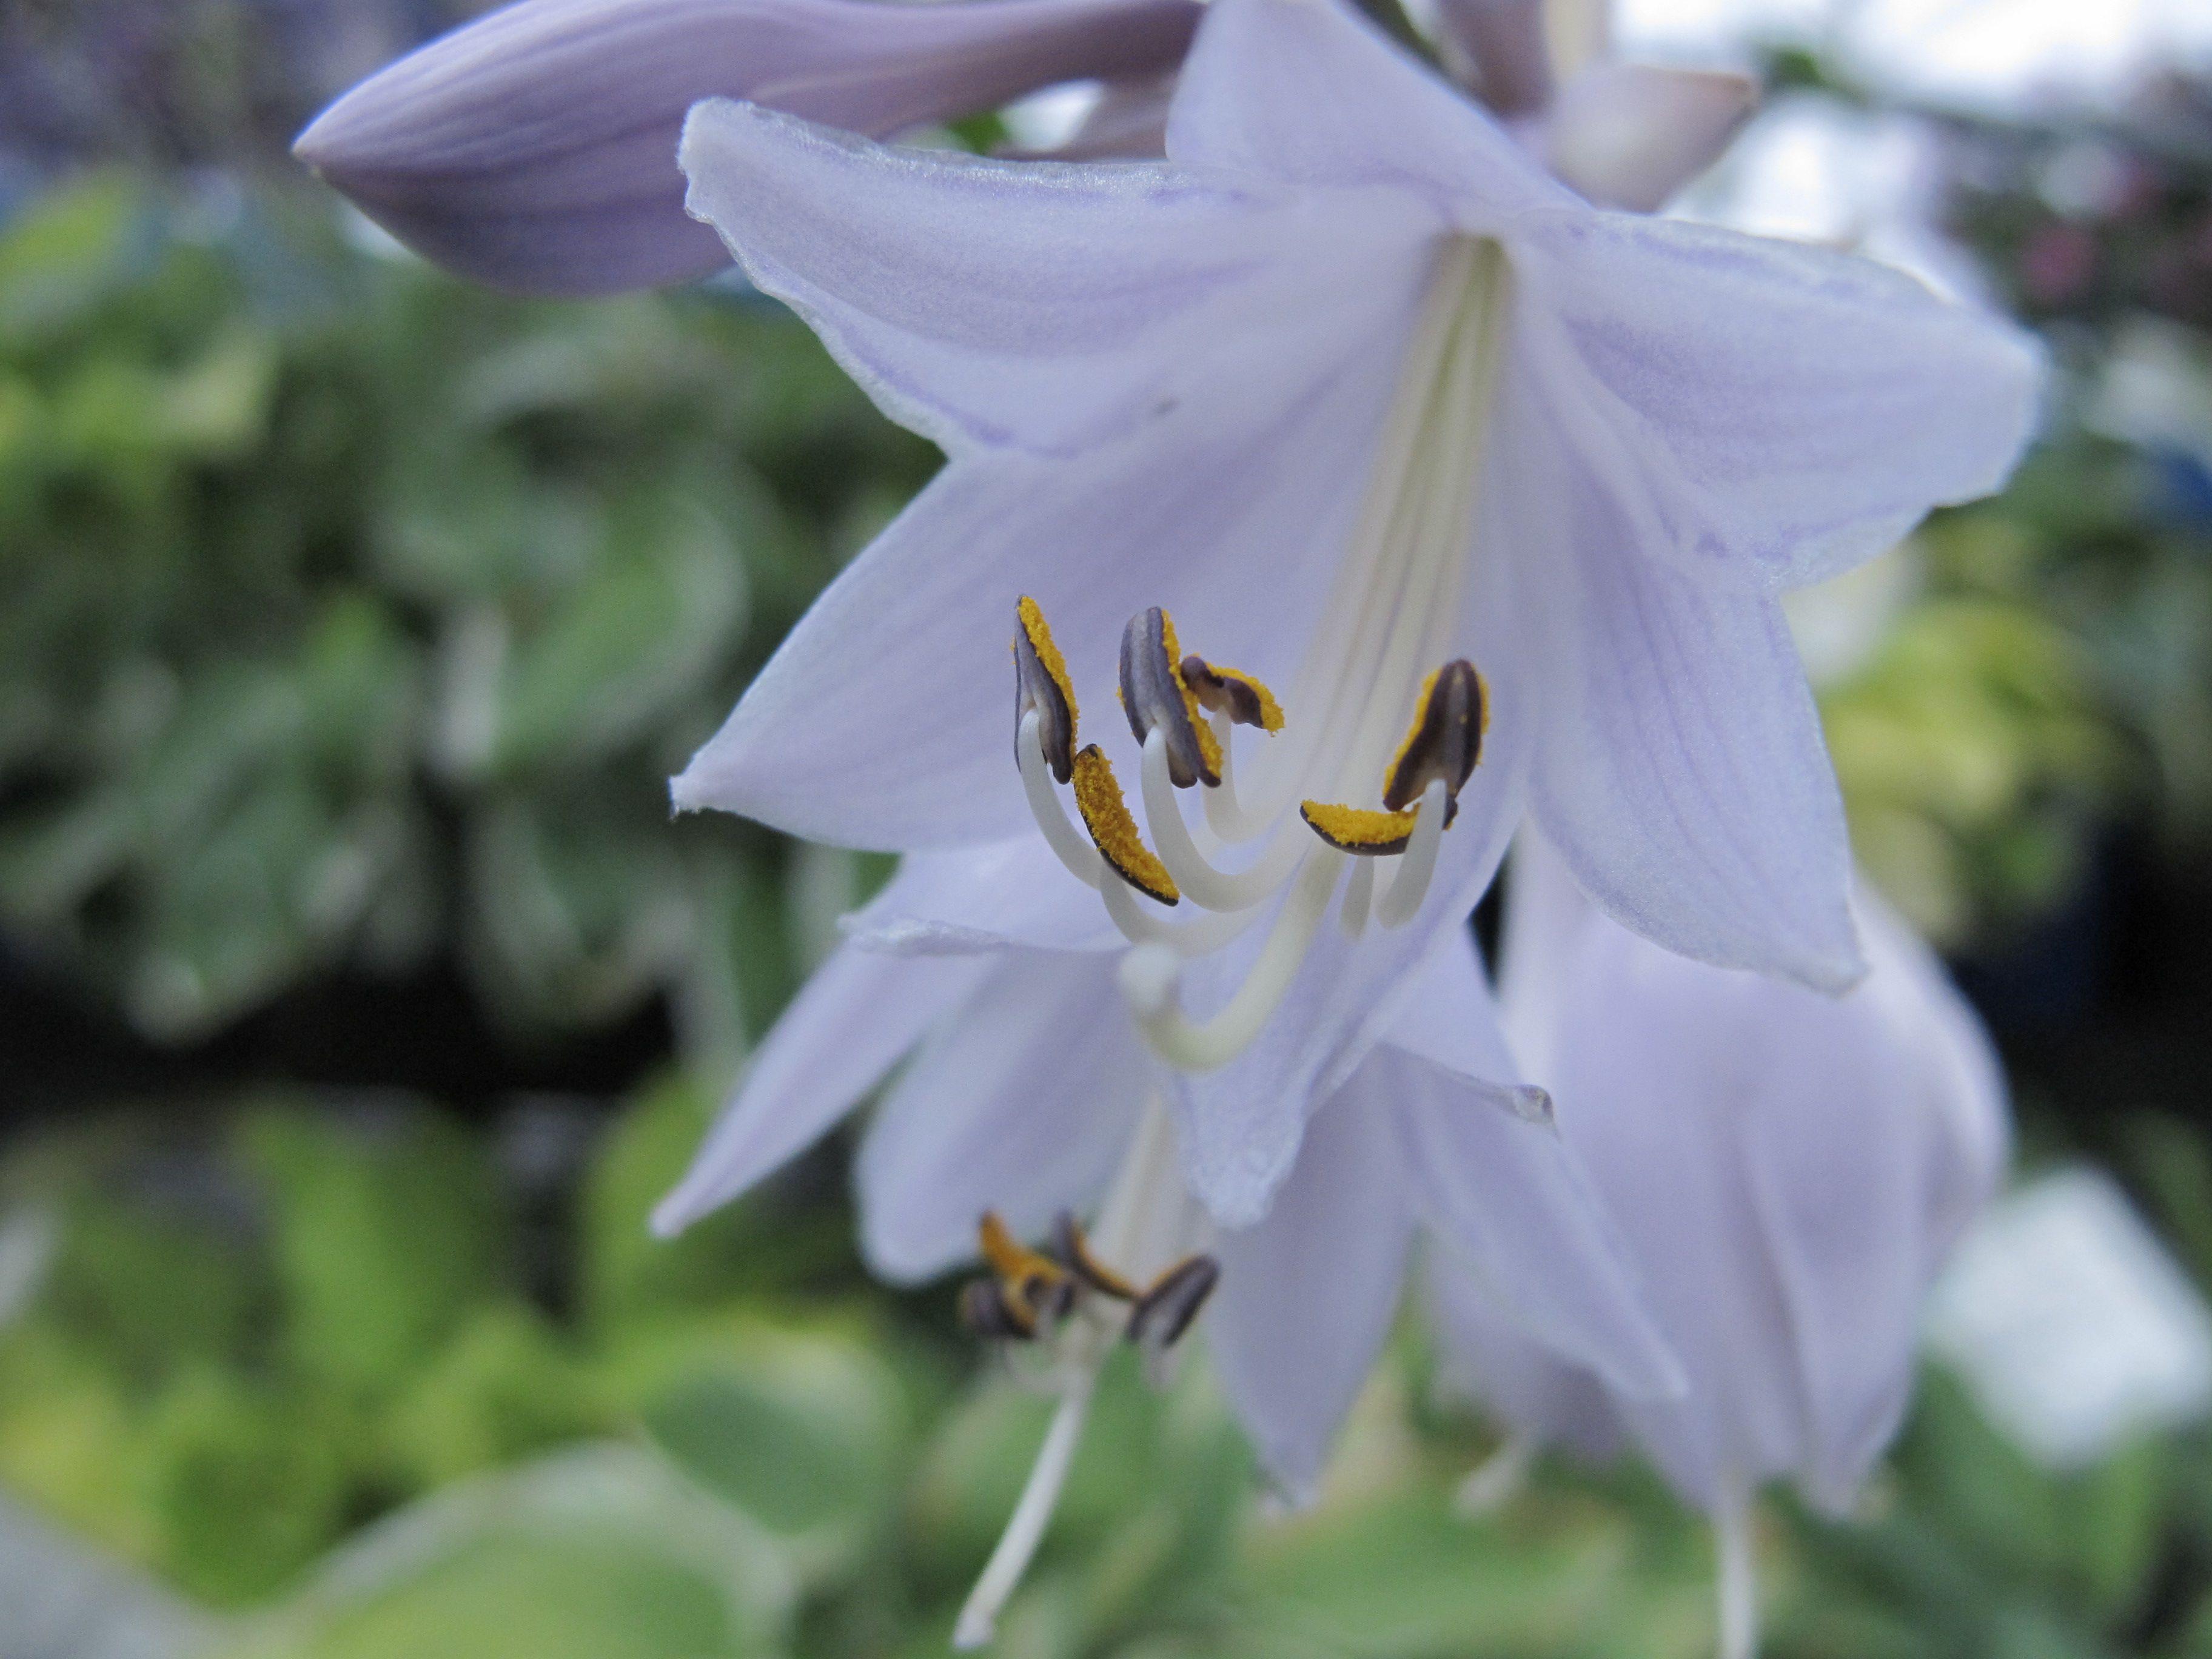 Soft shot of a flower testing my G11 (a pocket camera)